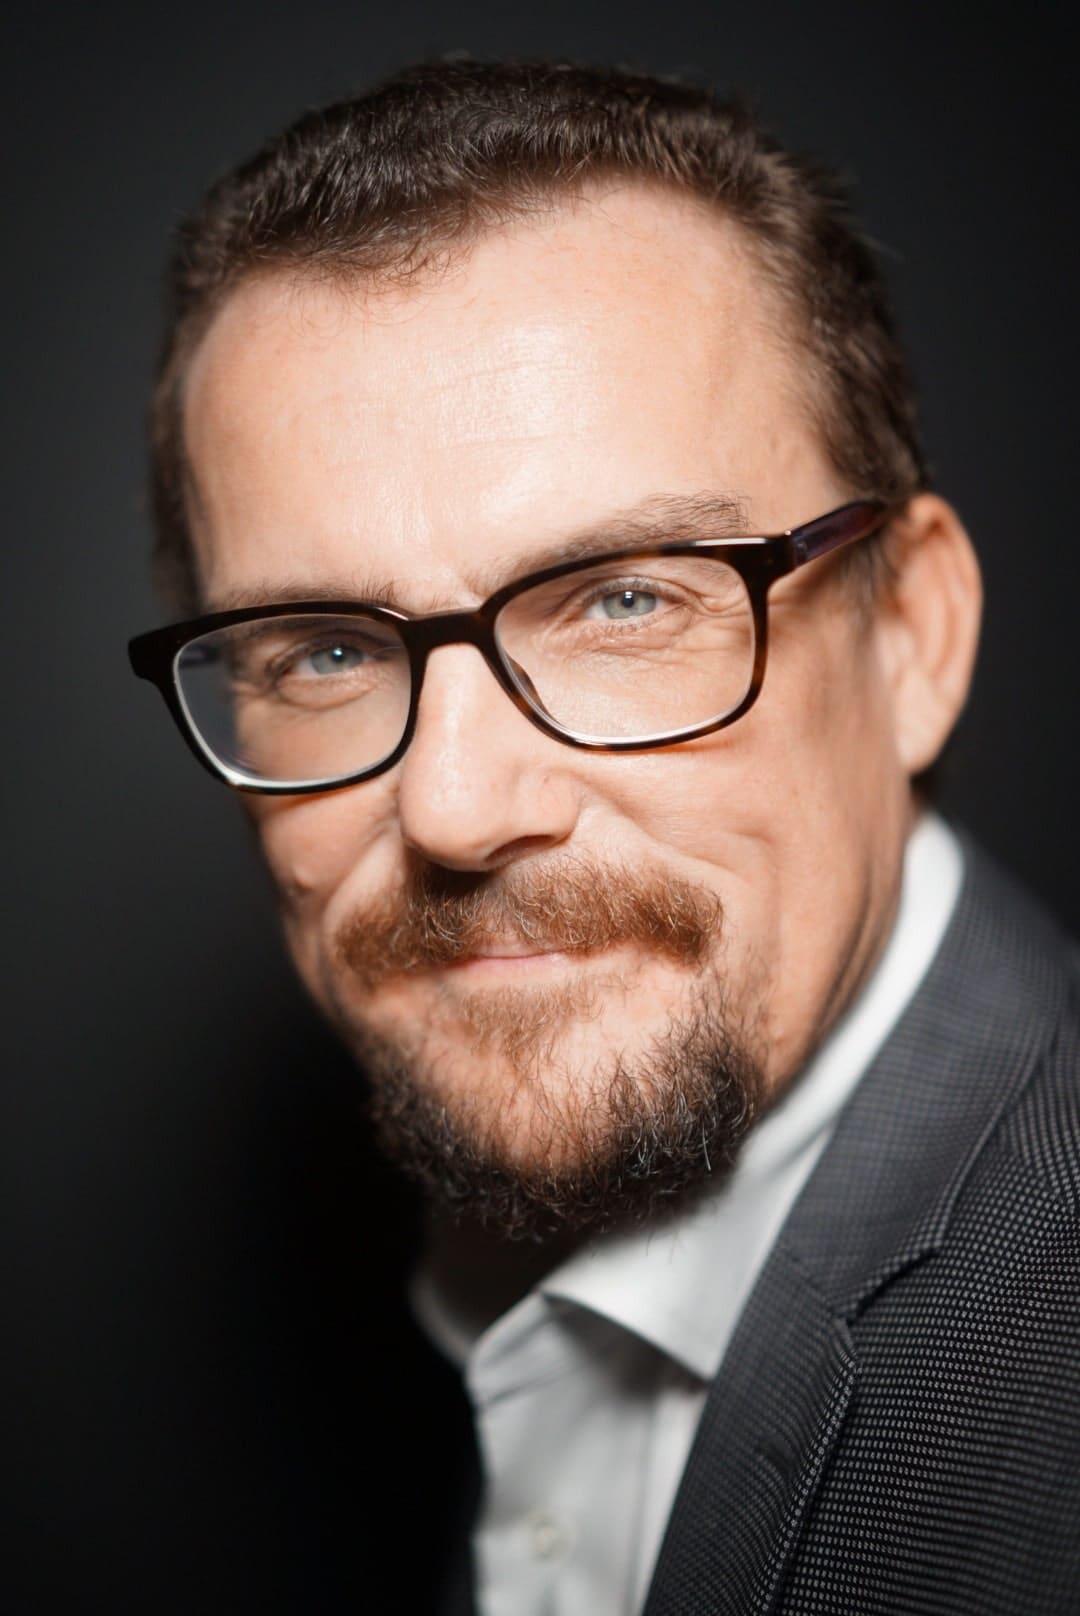 François Deswartes